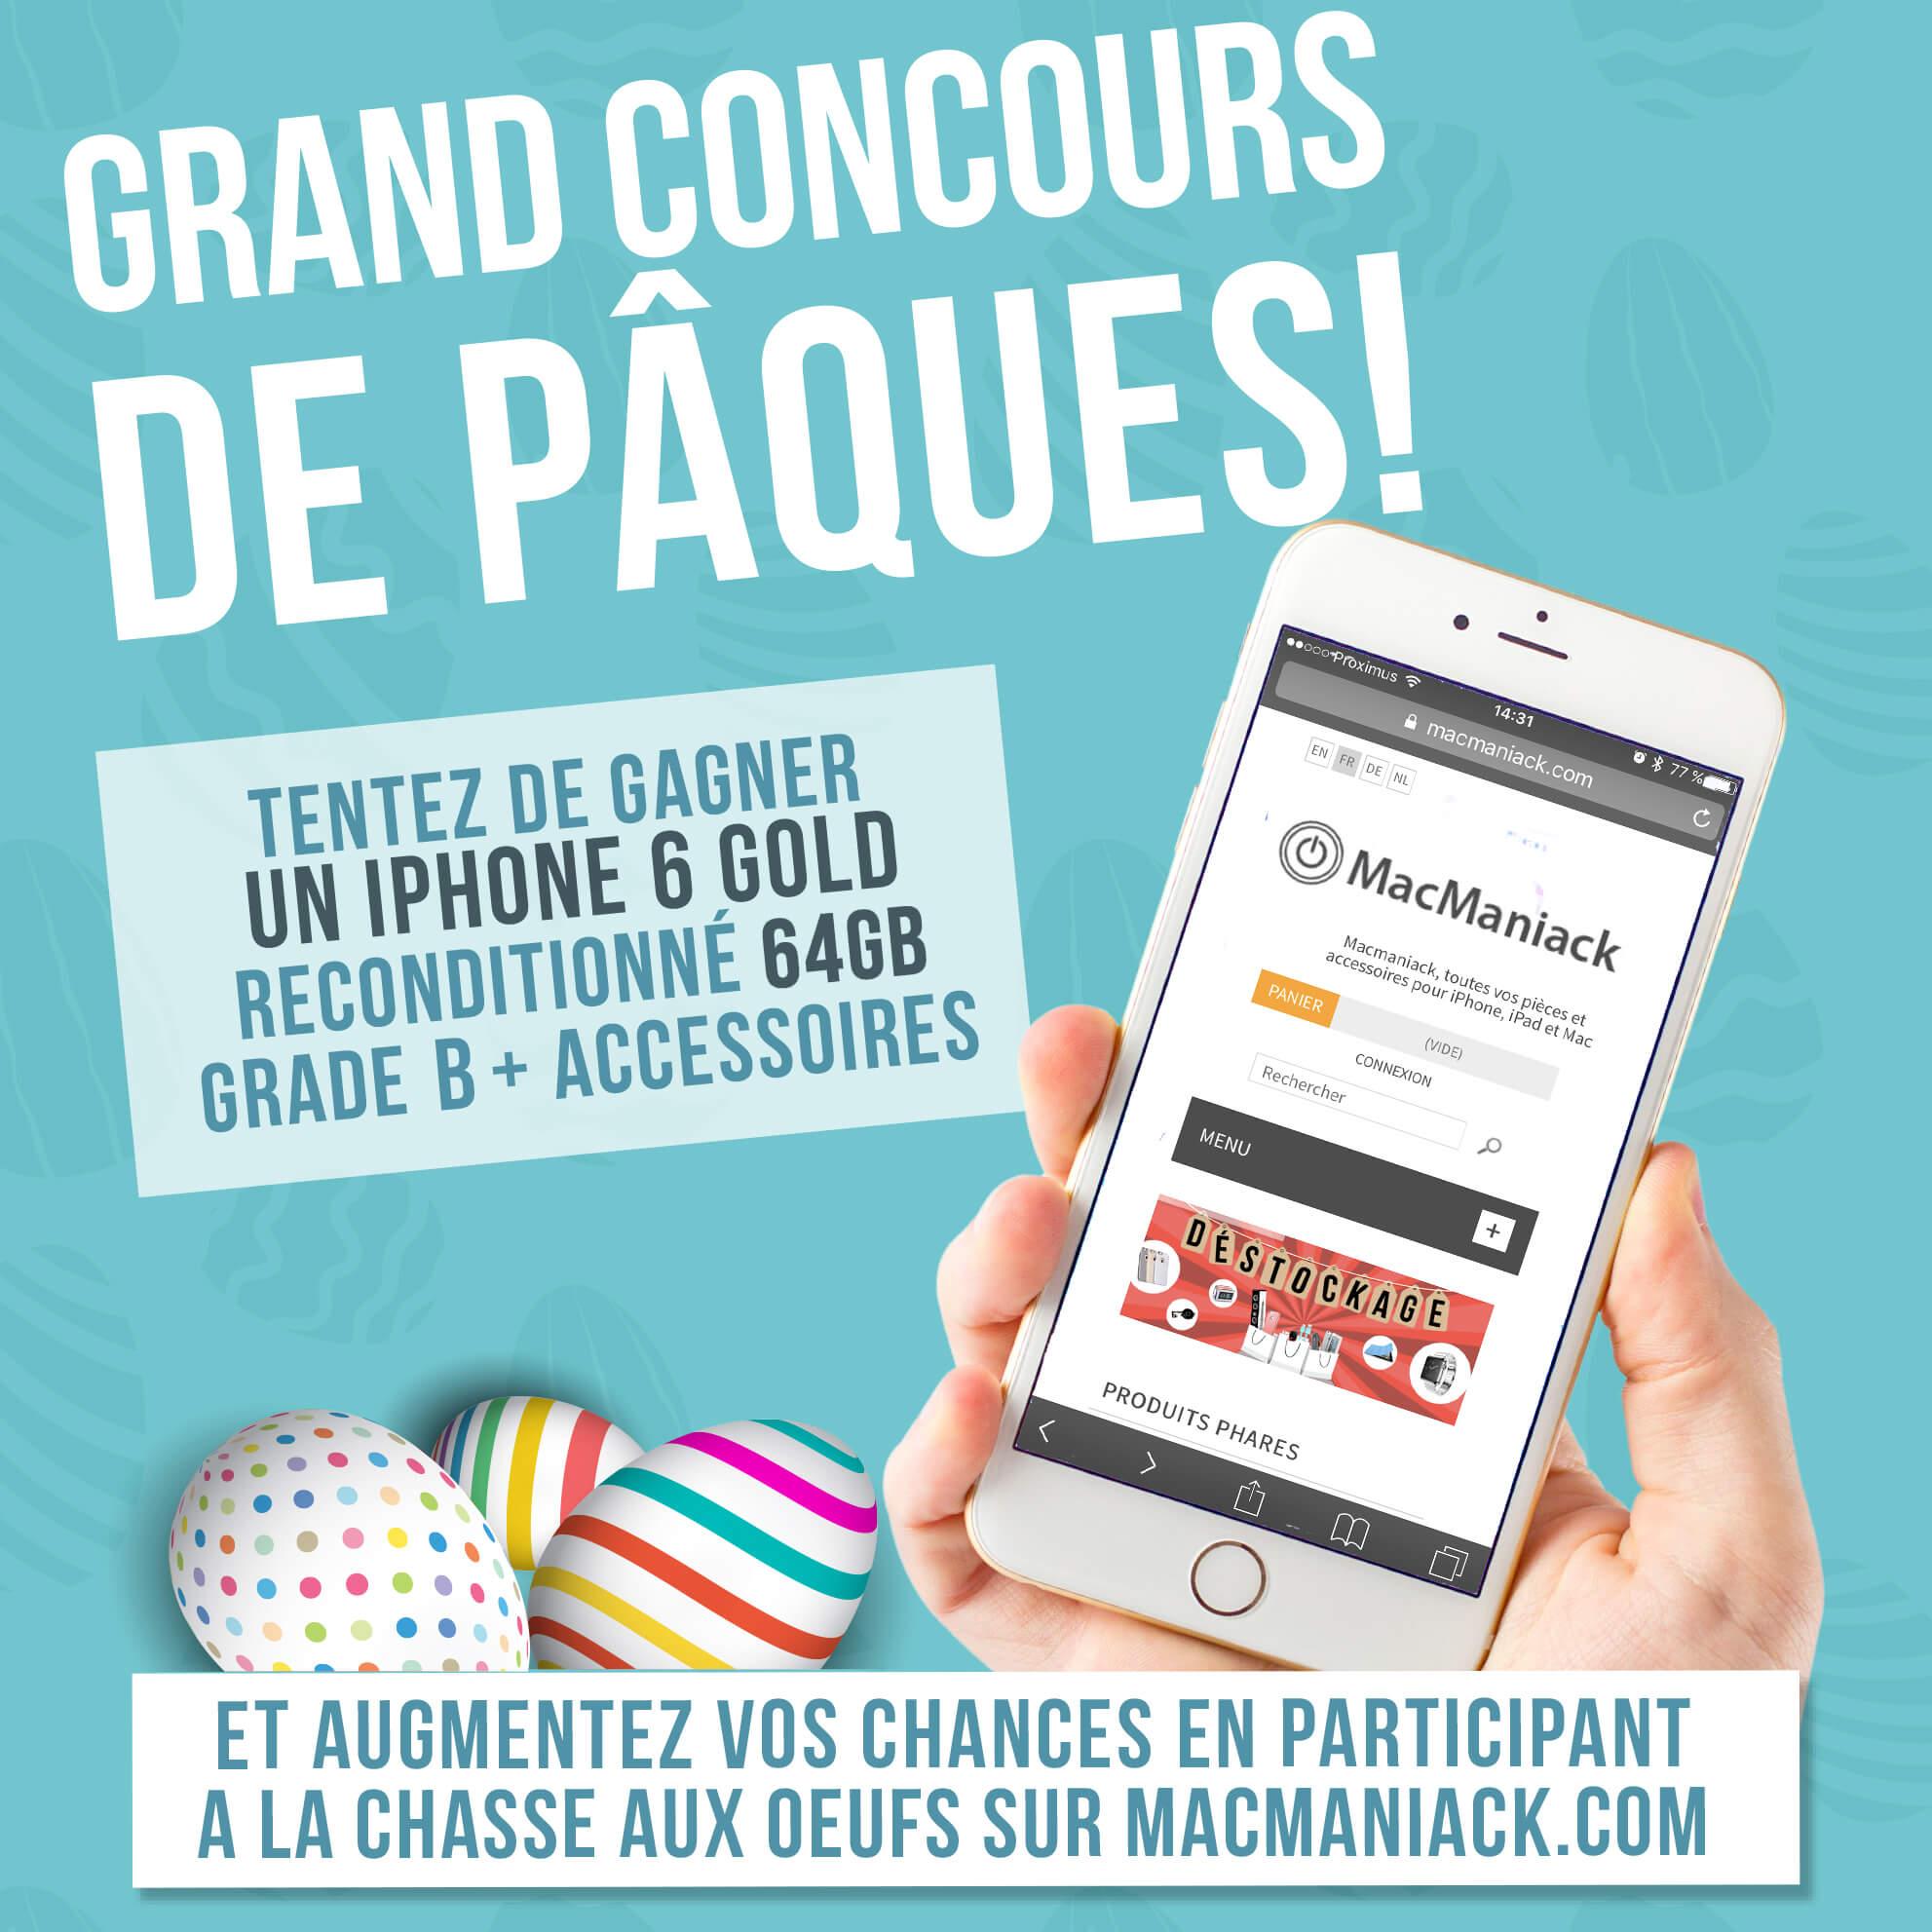 Grand concours Facebook Pâques gagner un iPhone